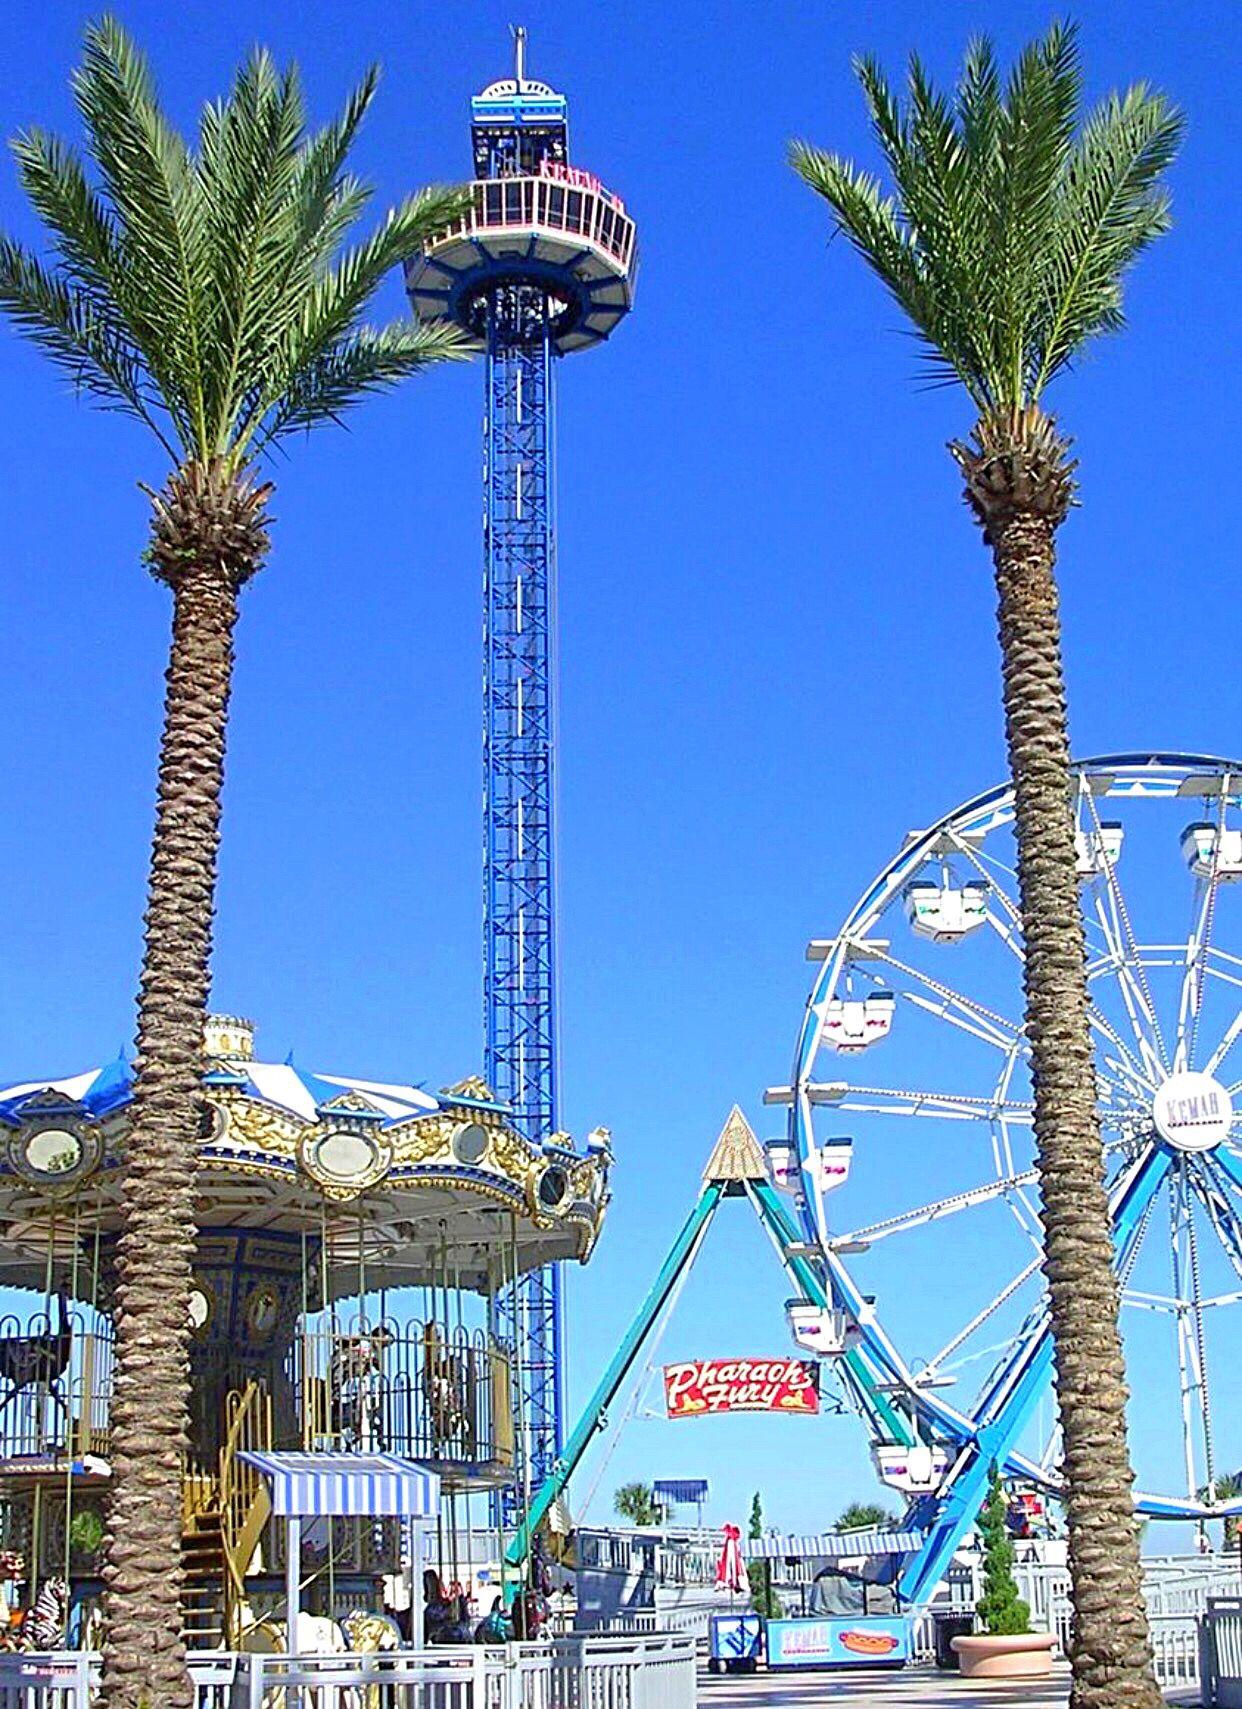 Kemah Boardwalk Texas | Carnival rides, Kemah boardwalk ...